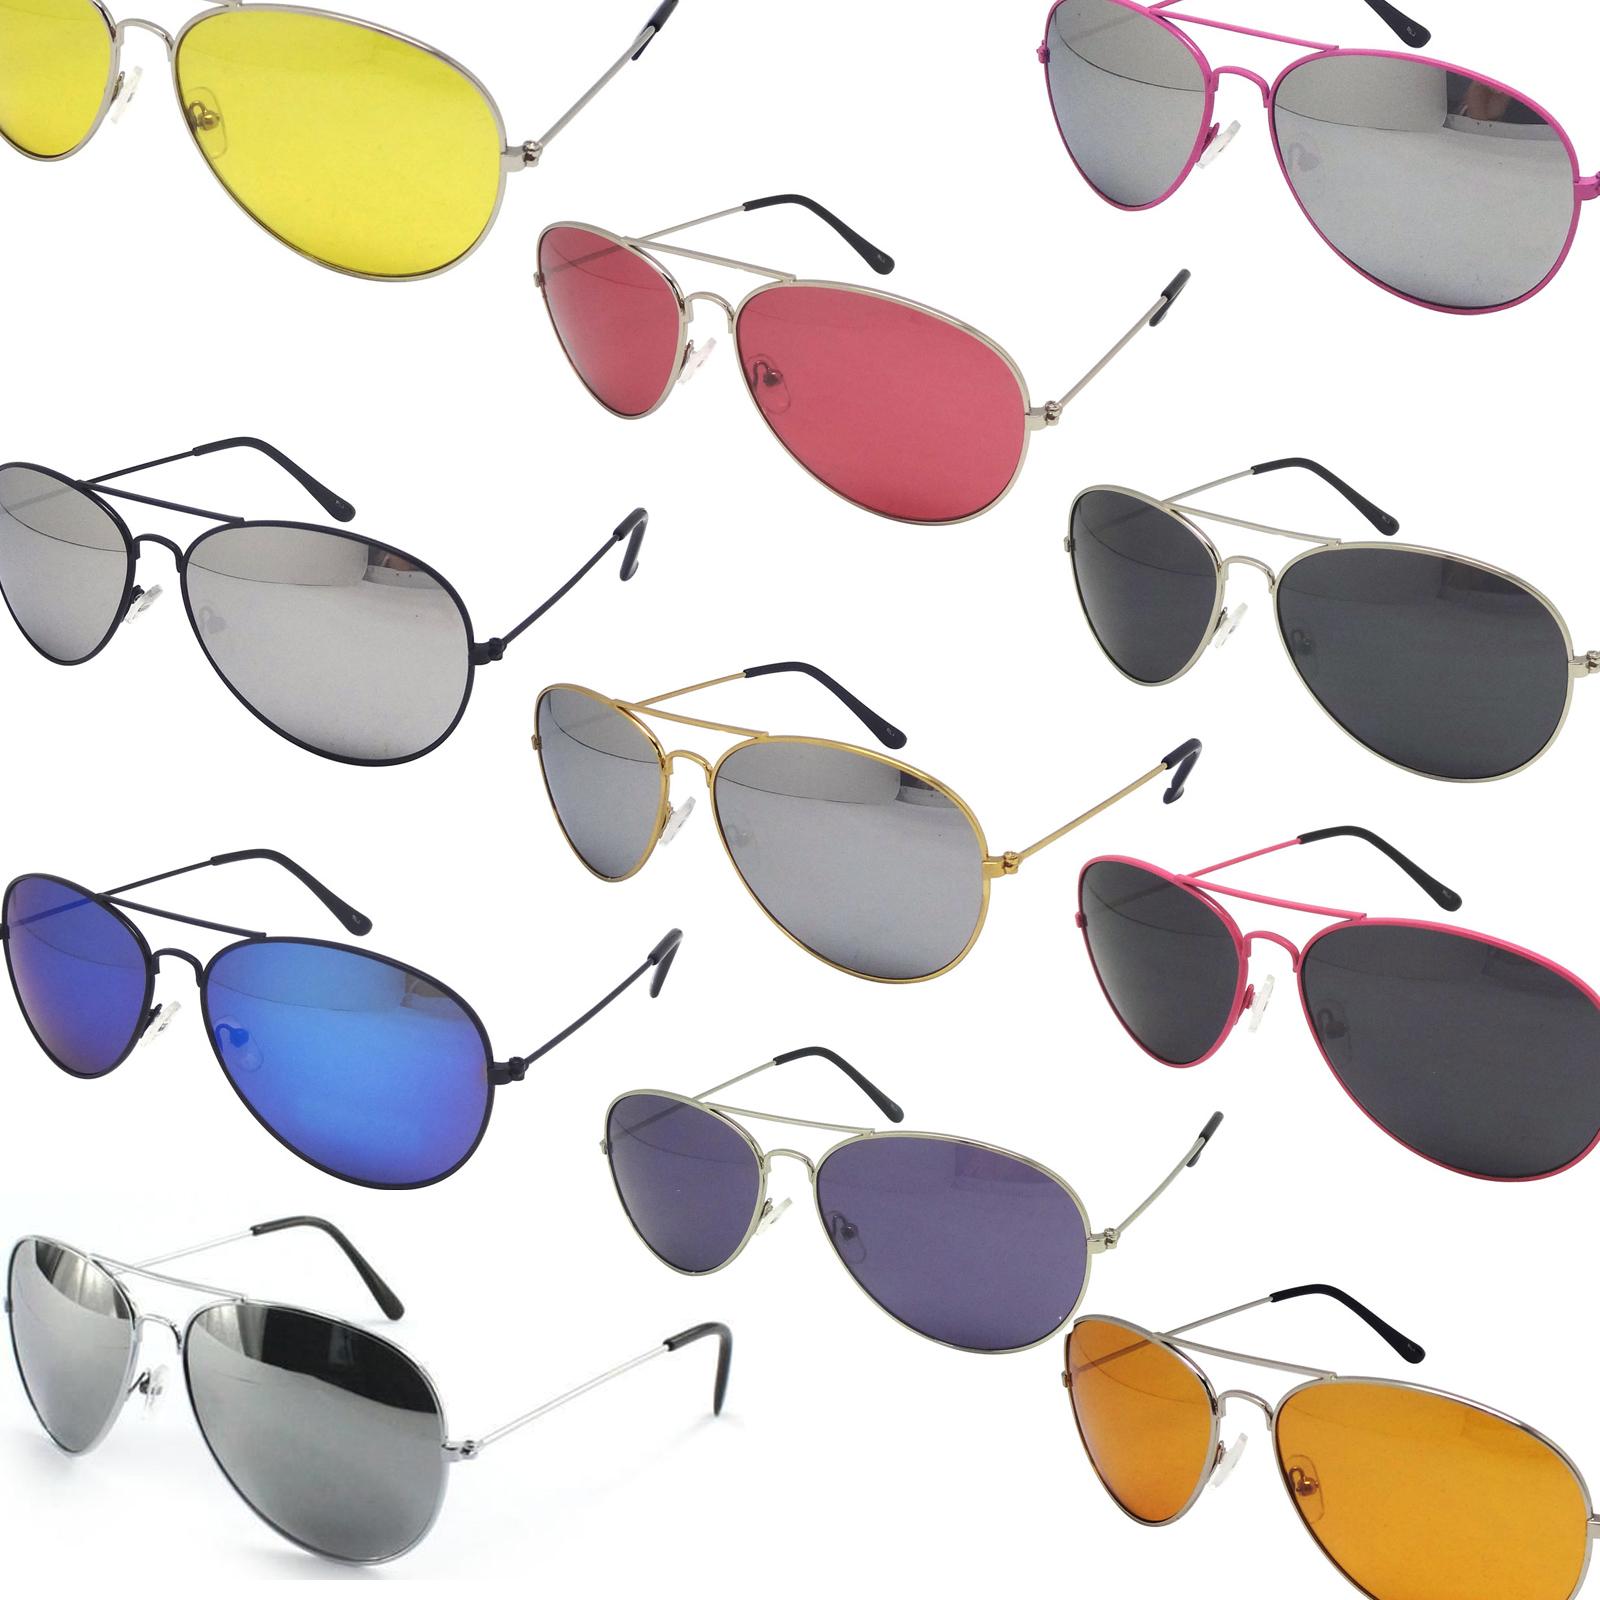 Aviator Sunglasses Fashion 80s Retro Style Designer Shades UV400 Lens Unisex | eBay